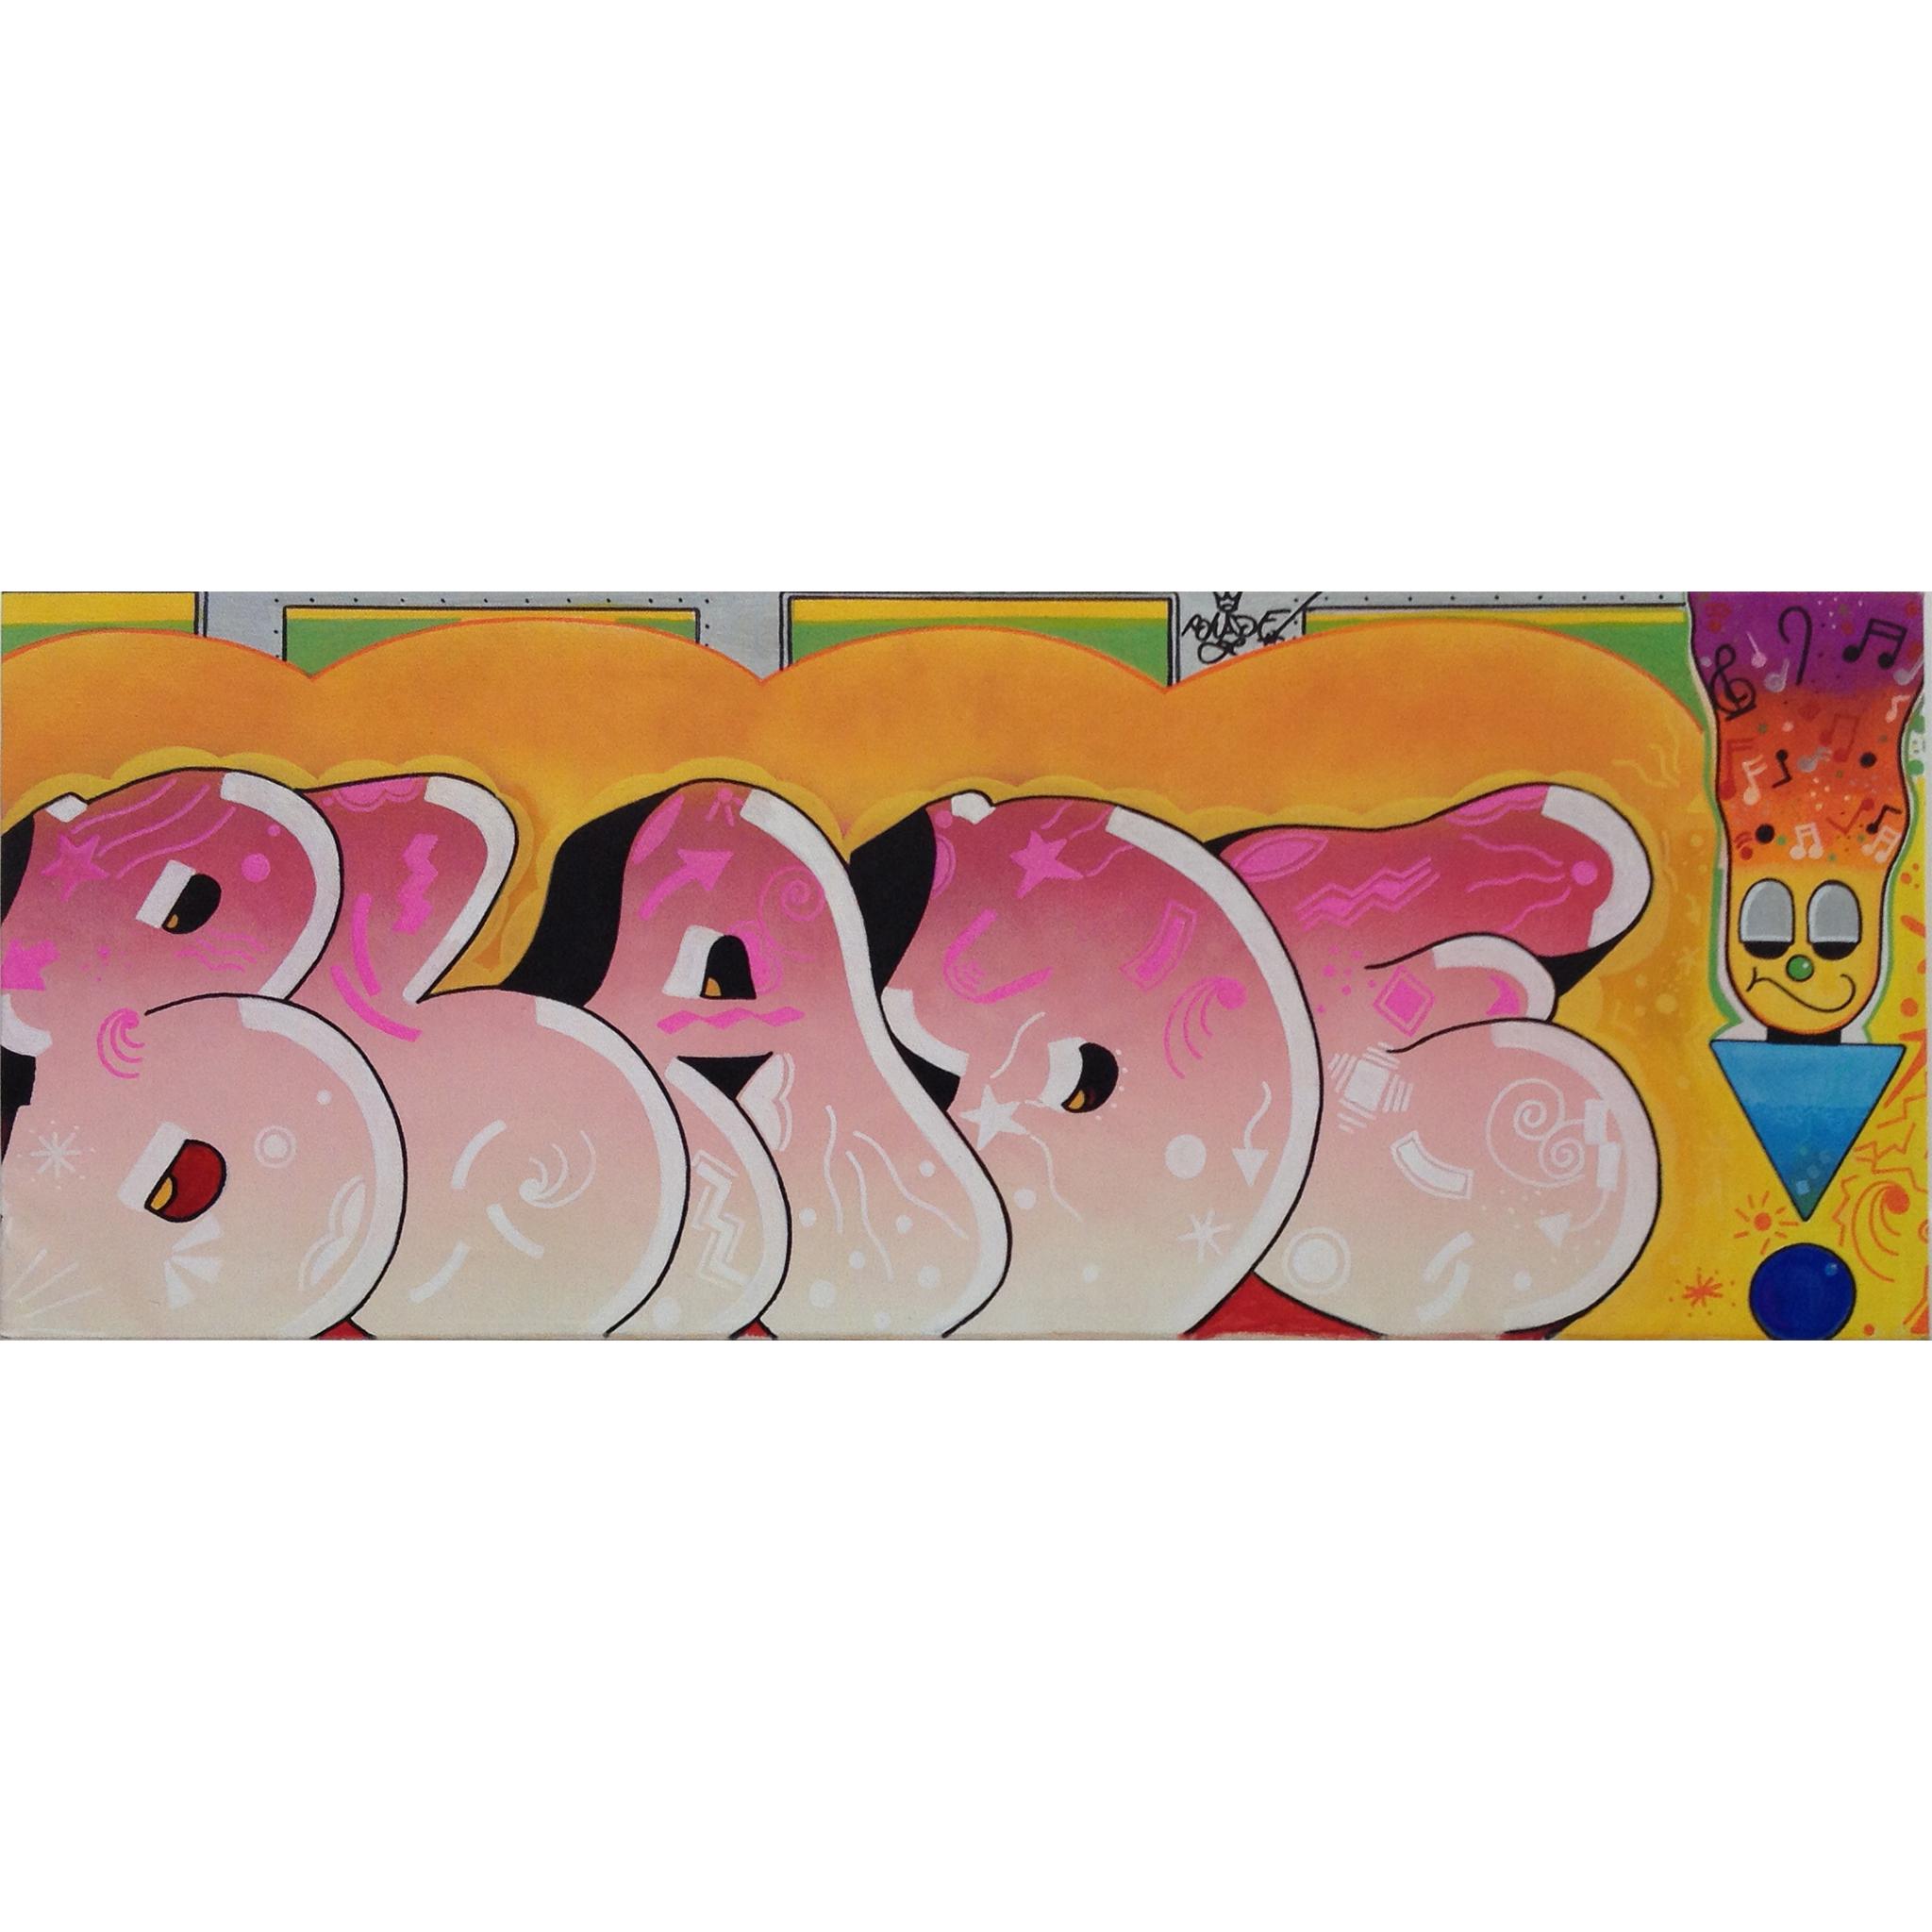 BLADE - DESIRE'S PASSION